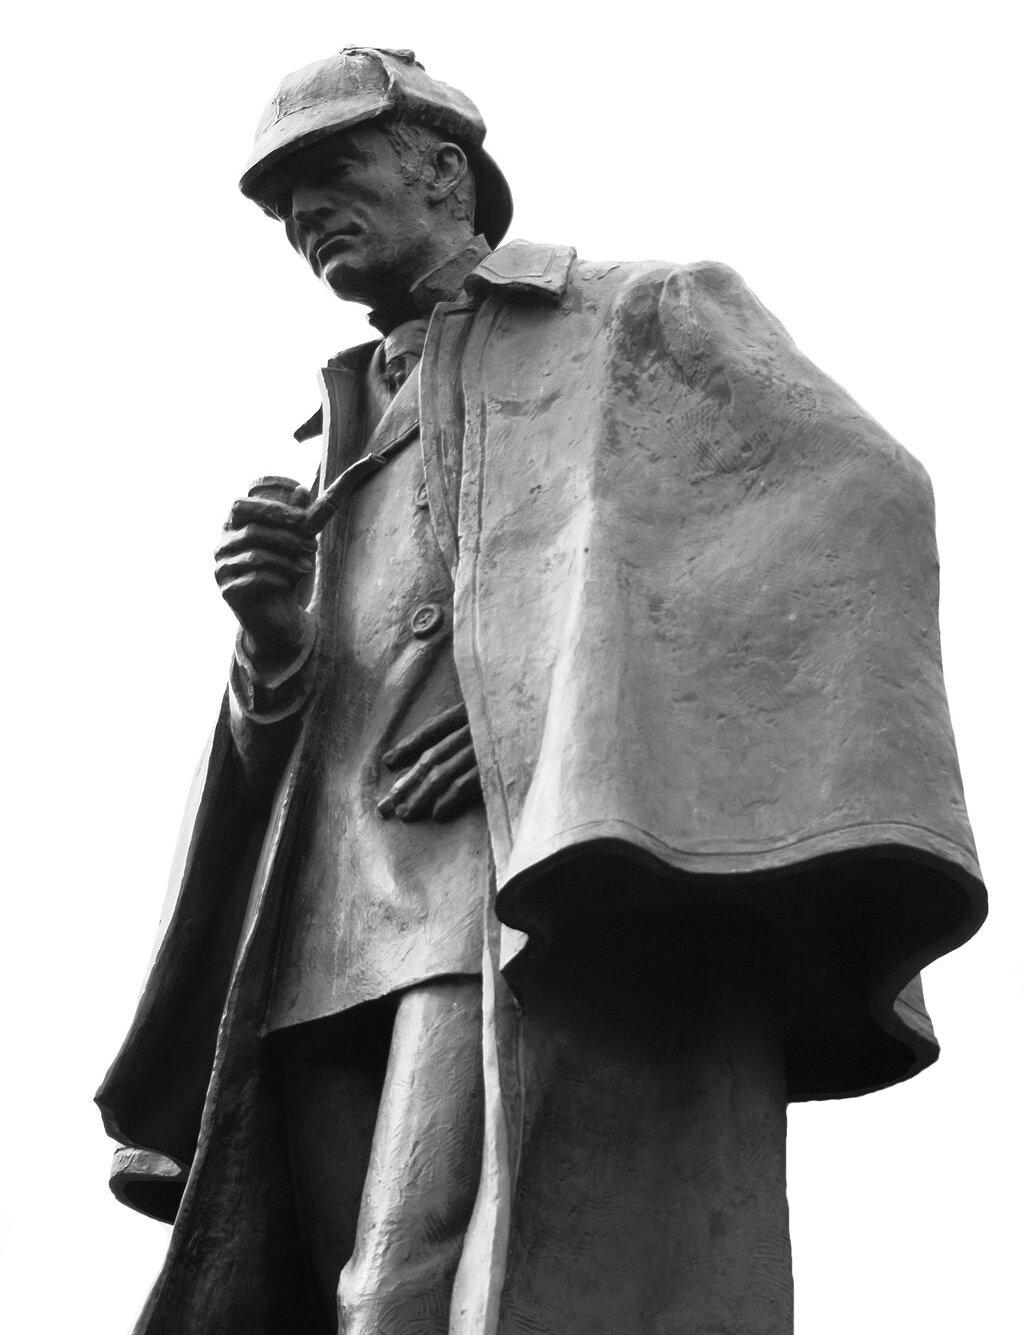 Pomnik Sherlocka Holmesa wEdynburgu Pomnik Sherlocka Holmesa wEdynburgu Źródło: Siddharth Krish, fotografia barwna, licencja: CC BY-SA 3.0.